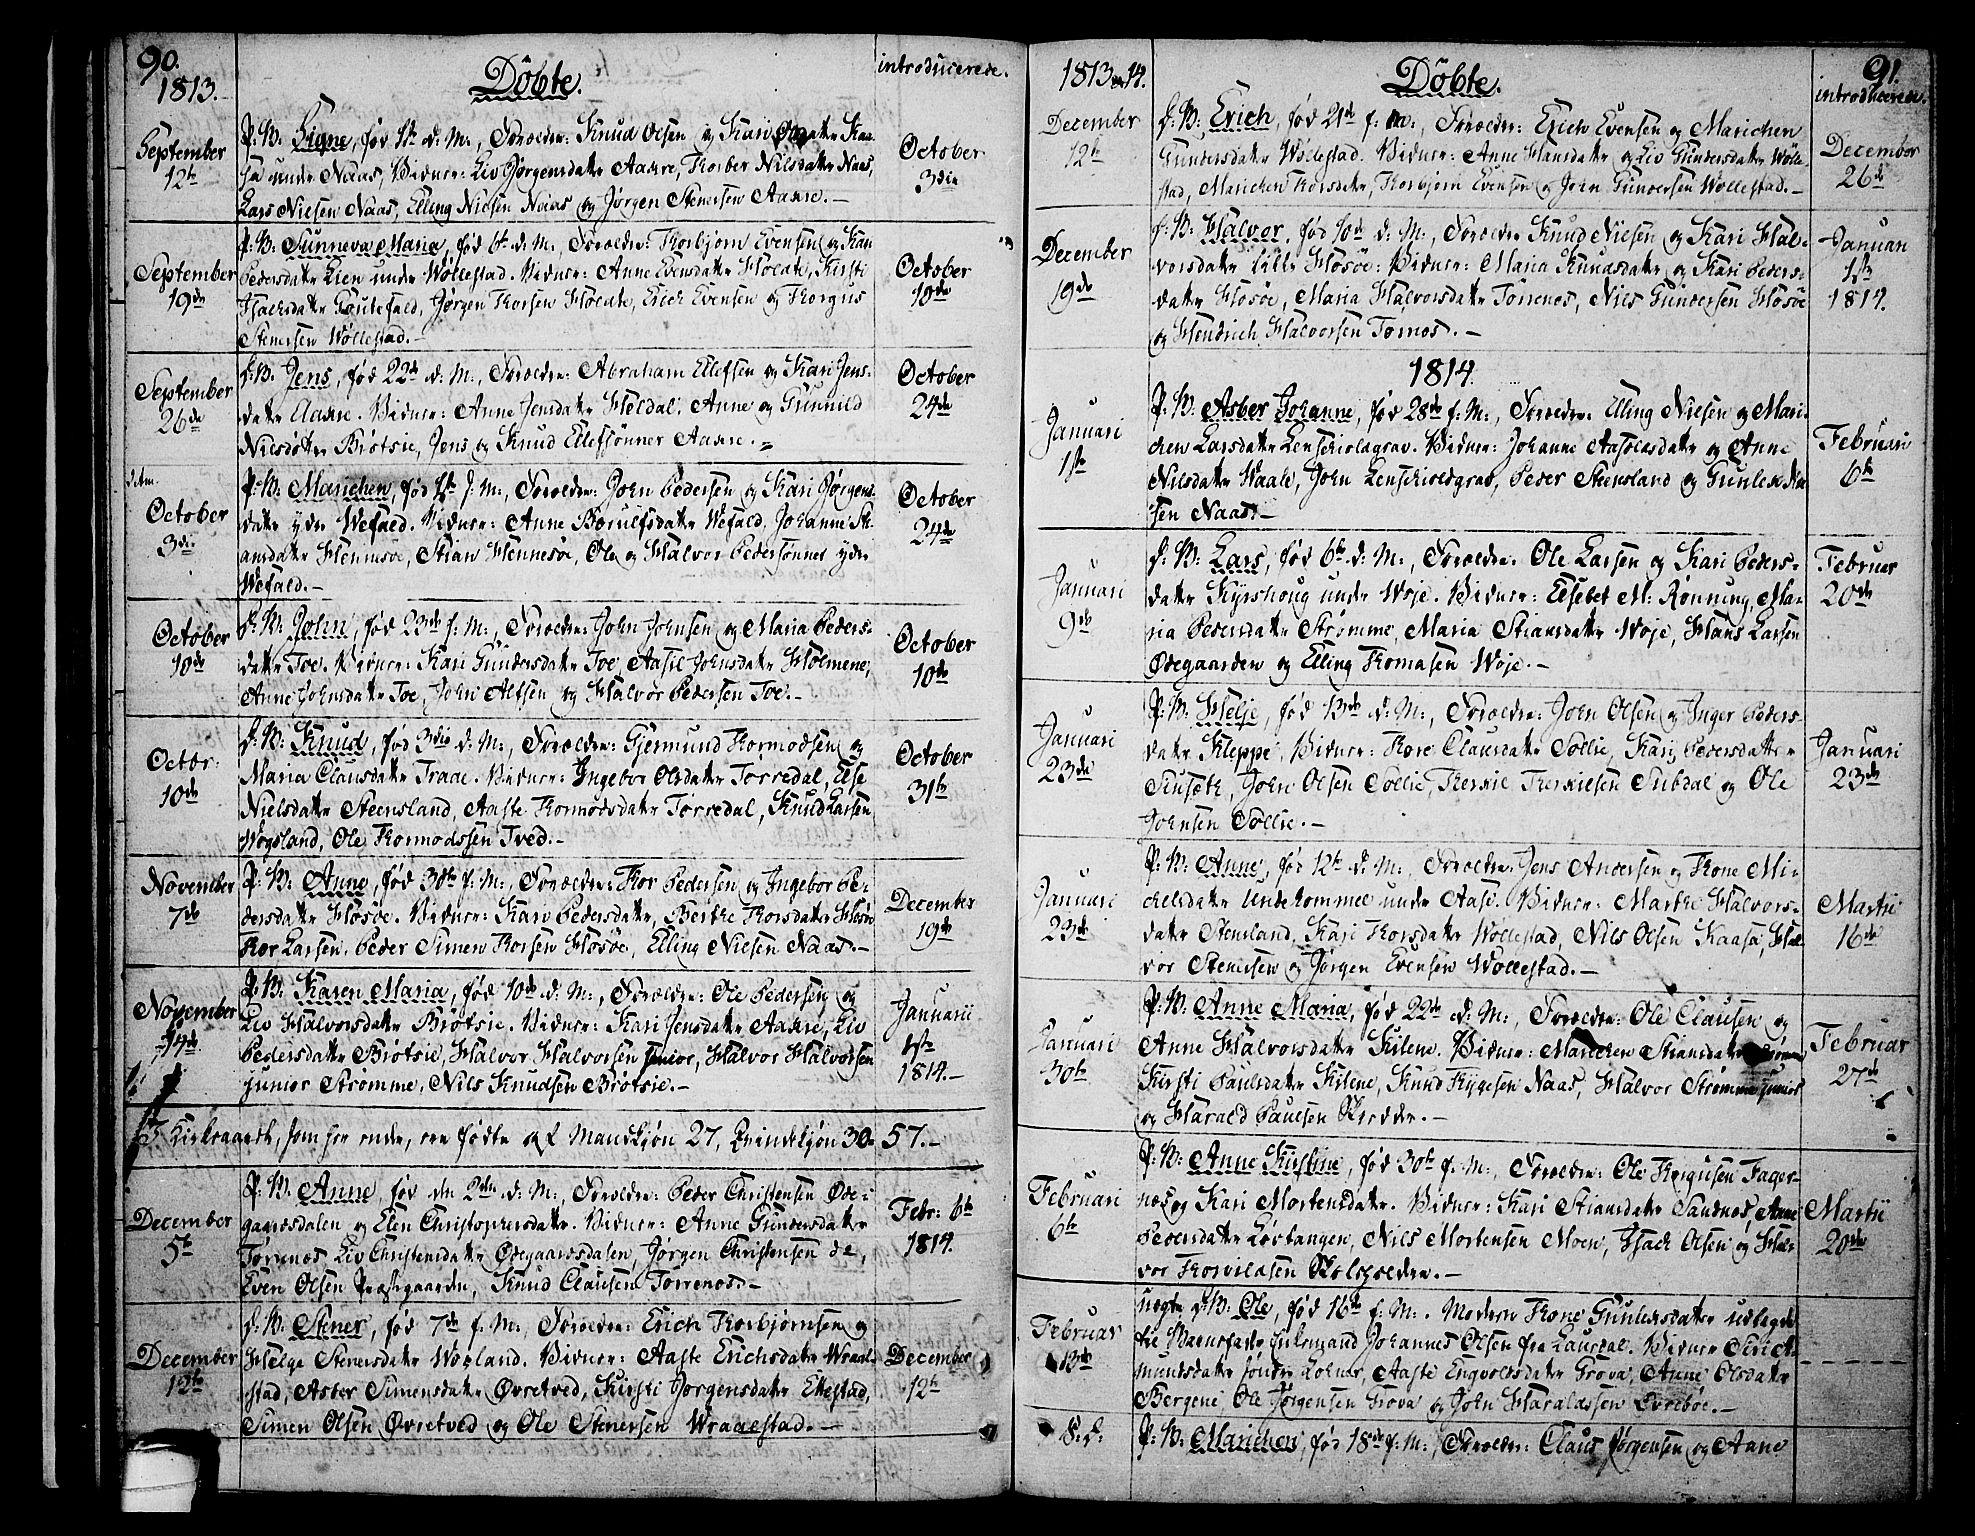 SAKO, Drangedal kirkebøker, F/Fa/L0004: Ministerialbok nr. 4, 1802-1814, s. 90-91